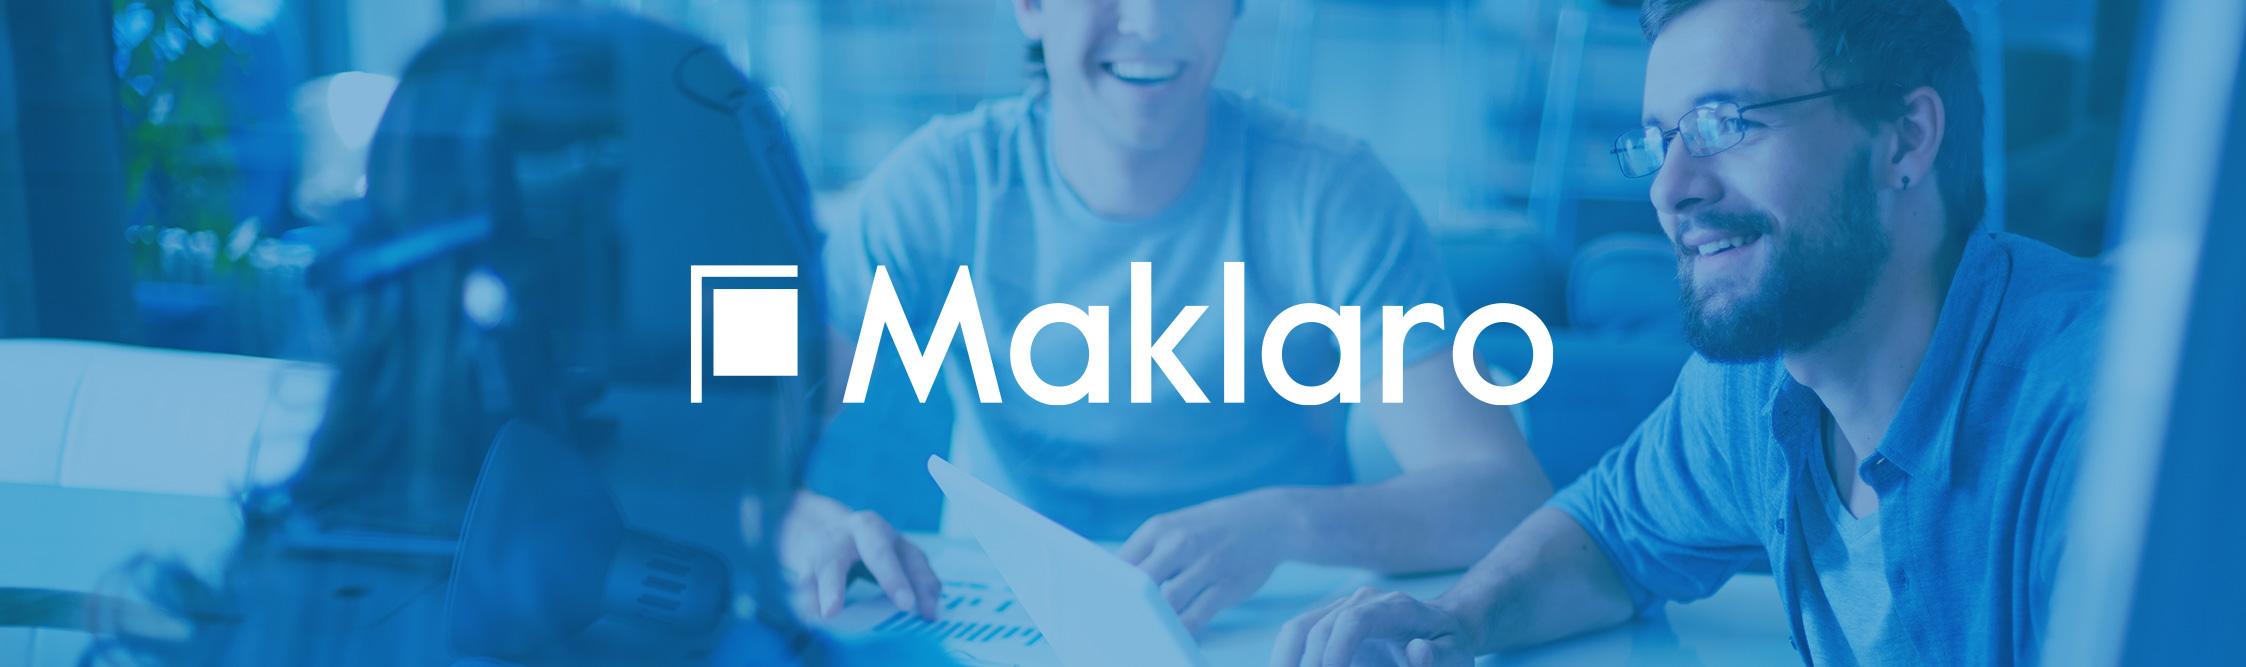 Maklaro GmbH